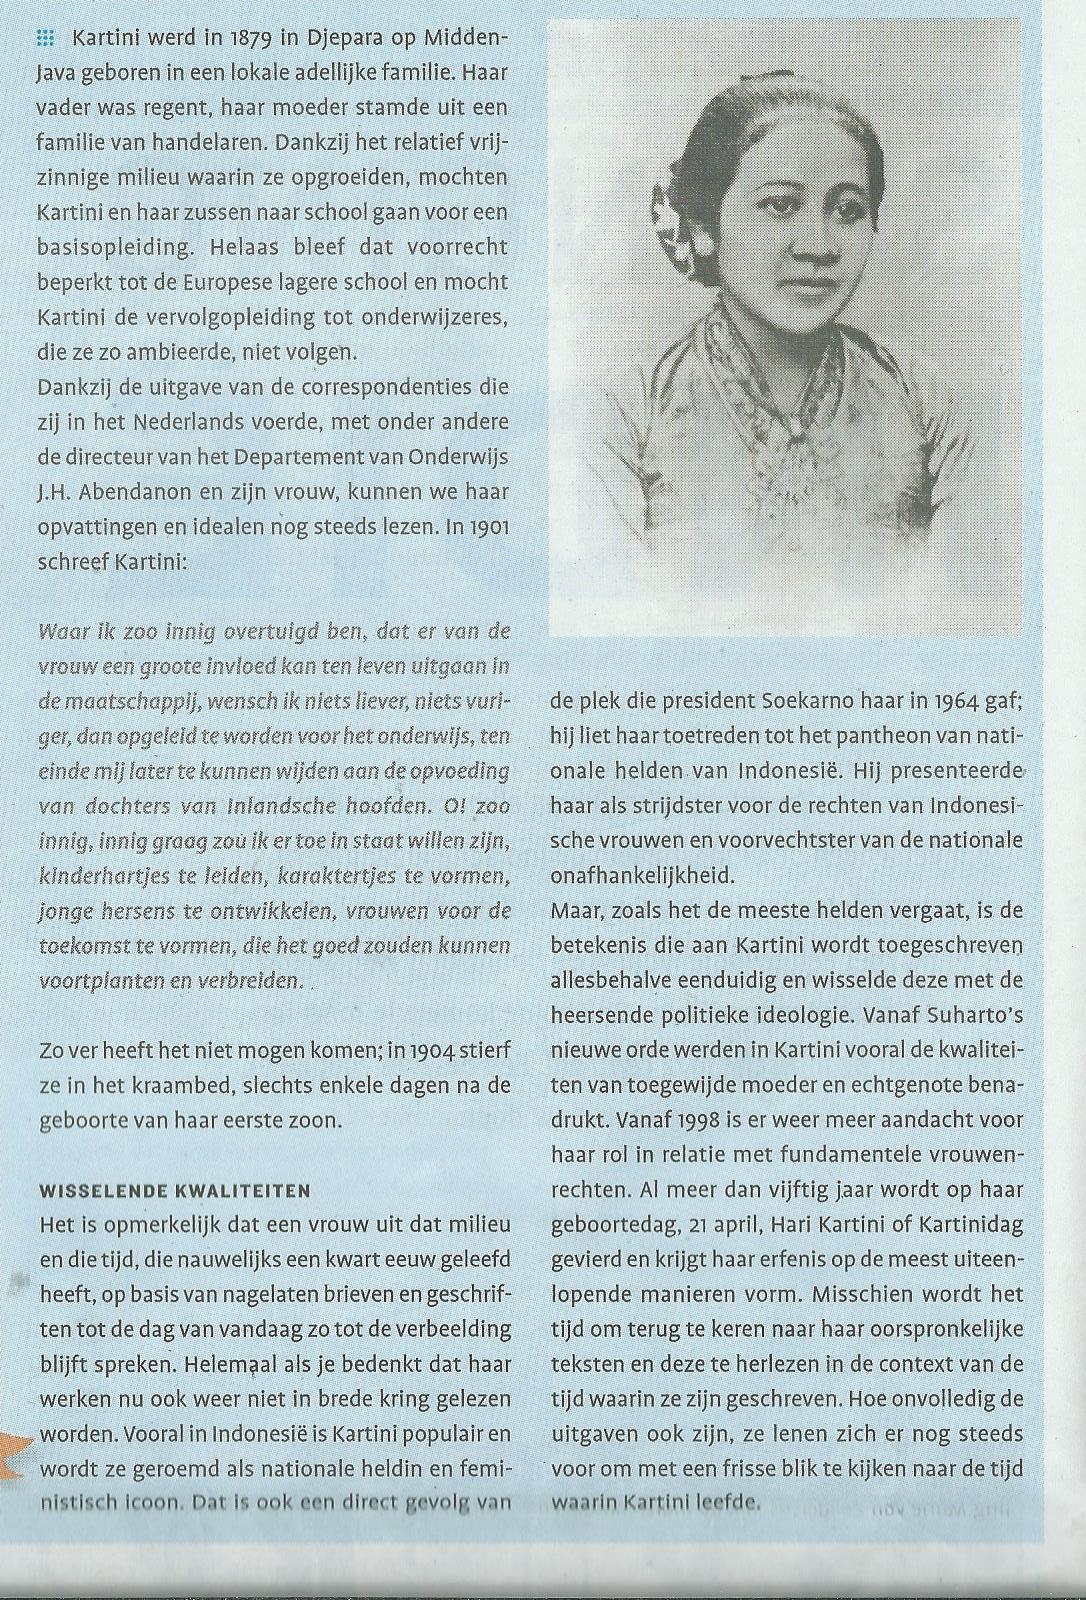 Kartini2.jpg